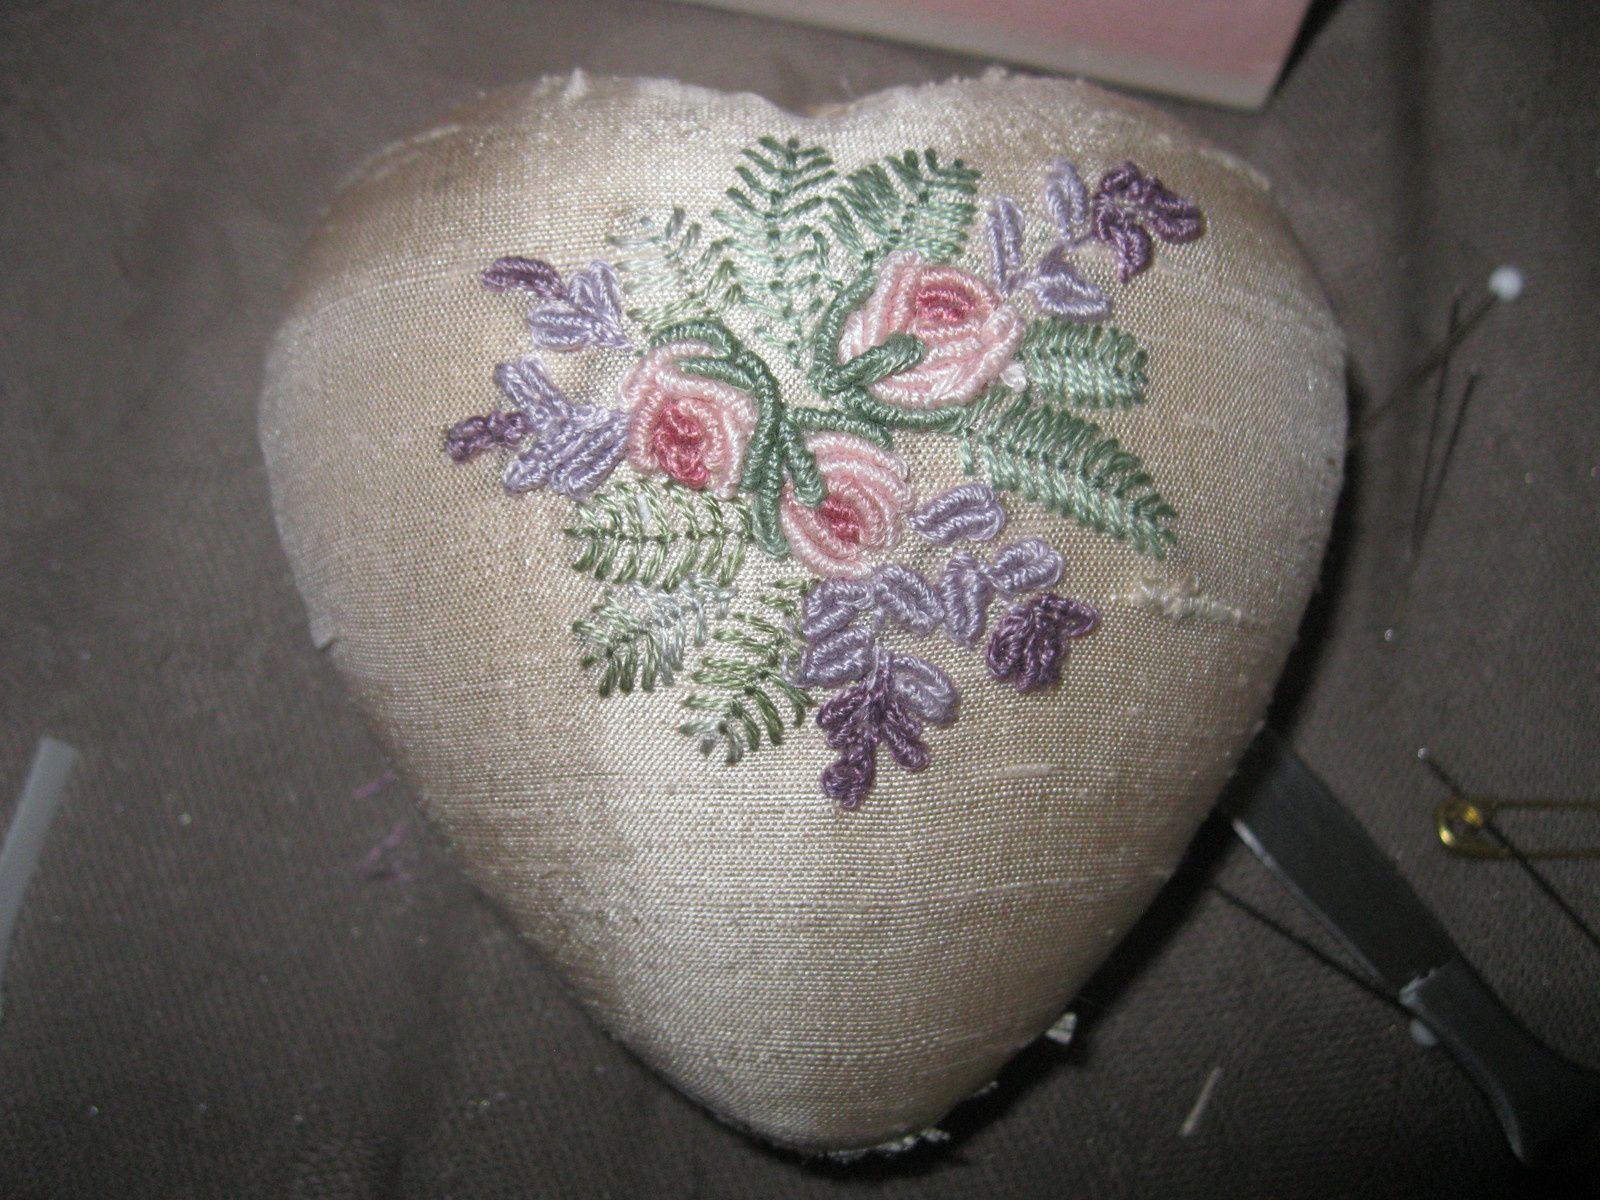 Coeur customisé - troisième coeur